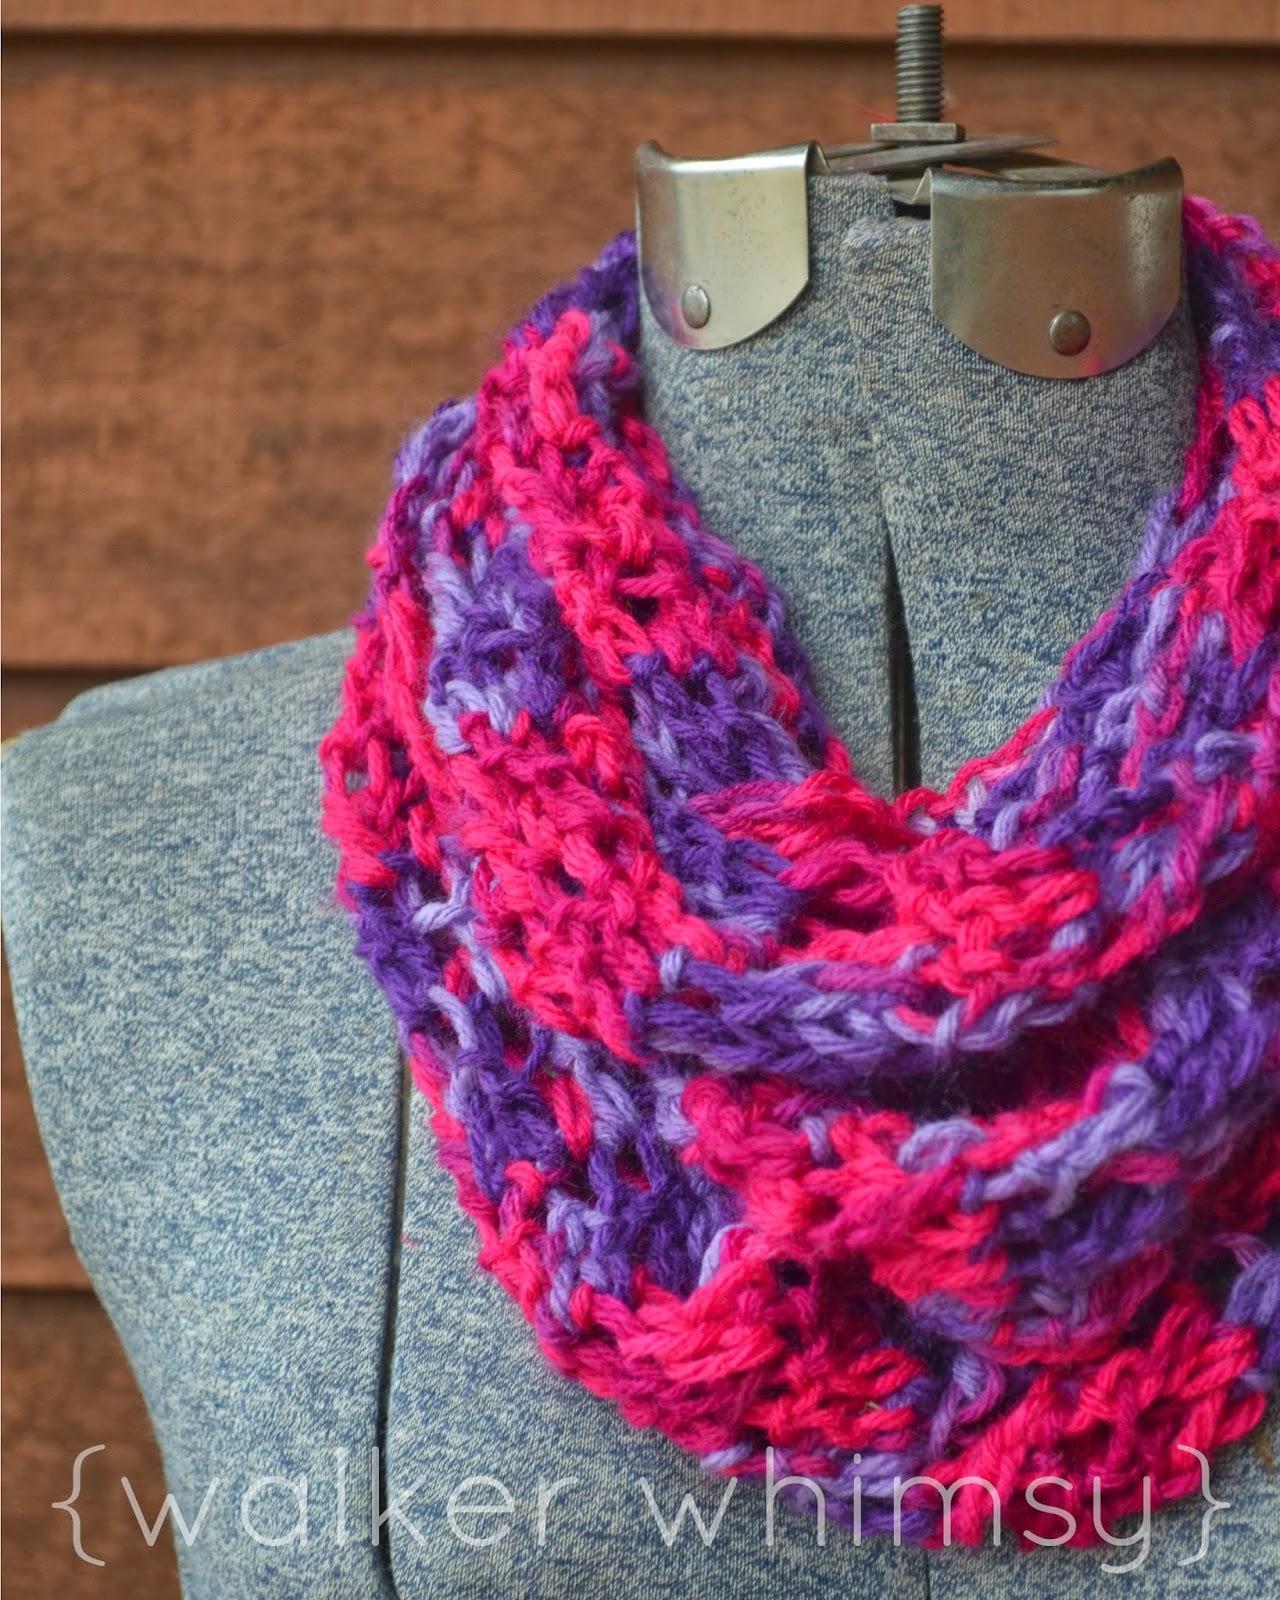 walker whimsy}: Crochet Infinity Scarf {POTM}